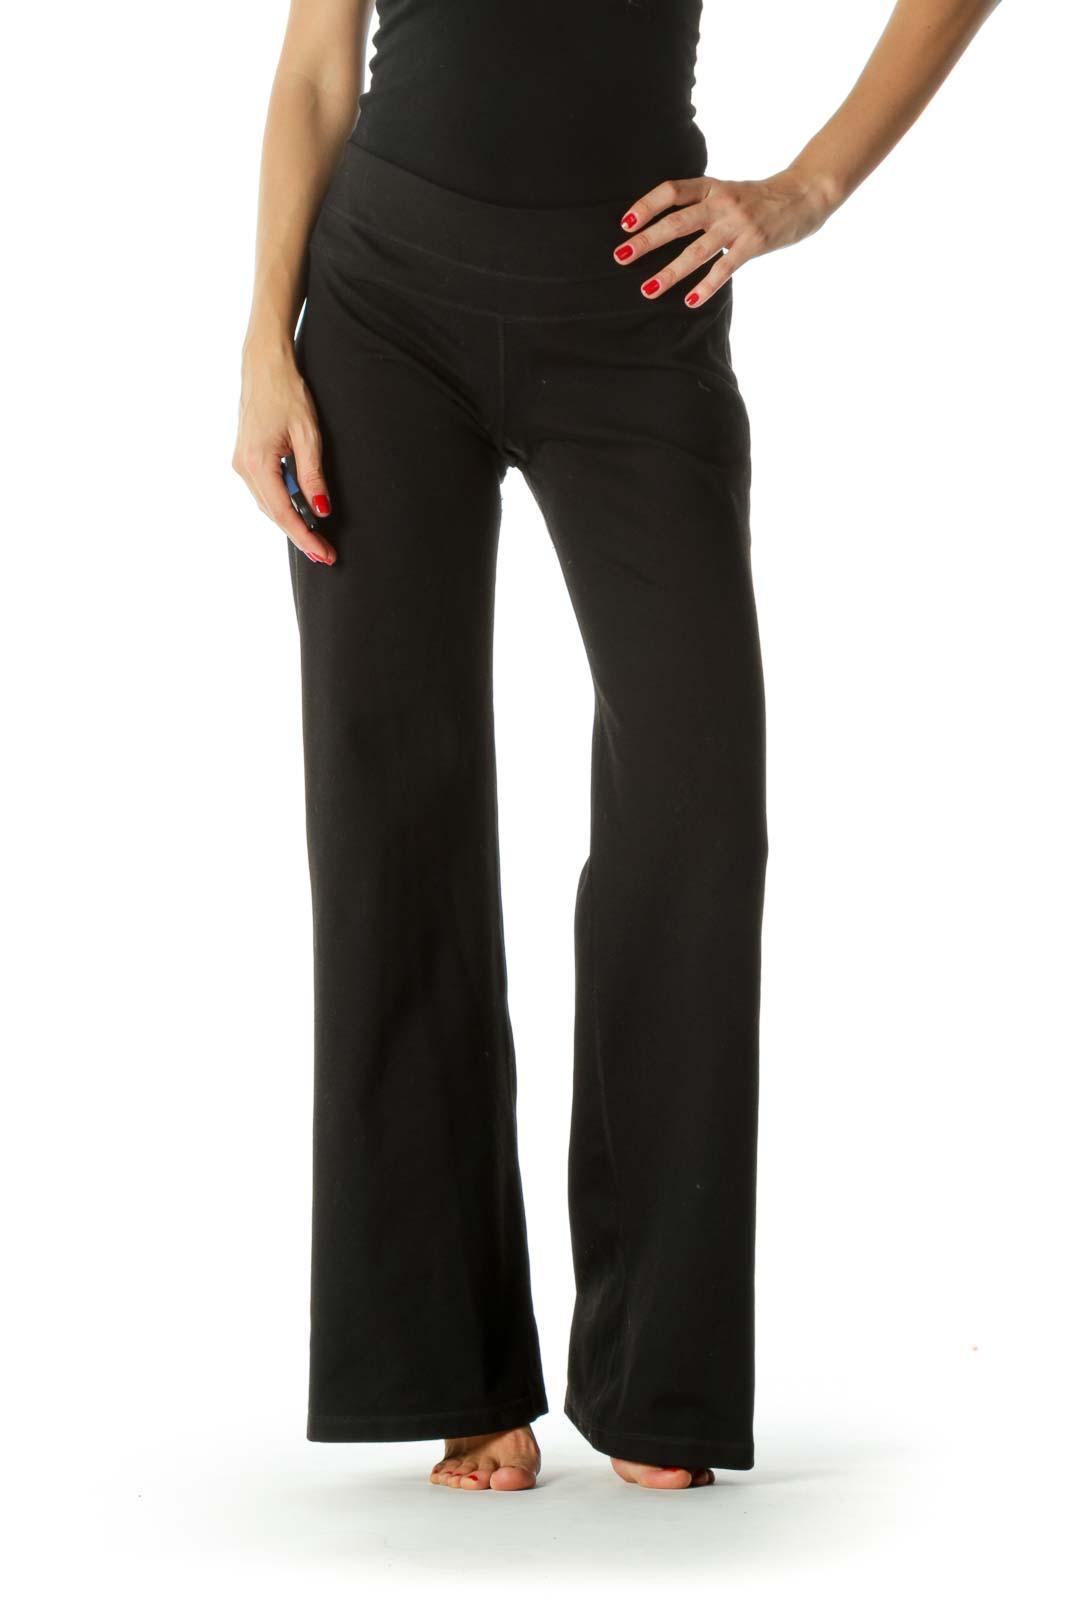 Black Stretch Active Pants